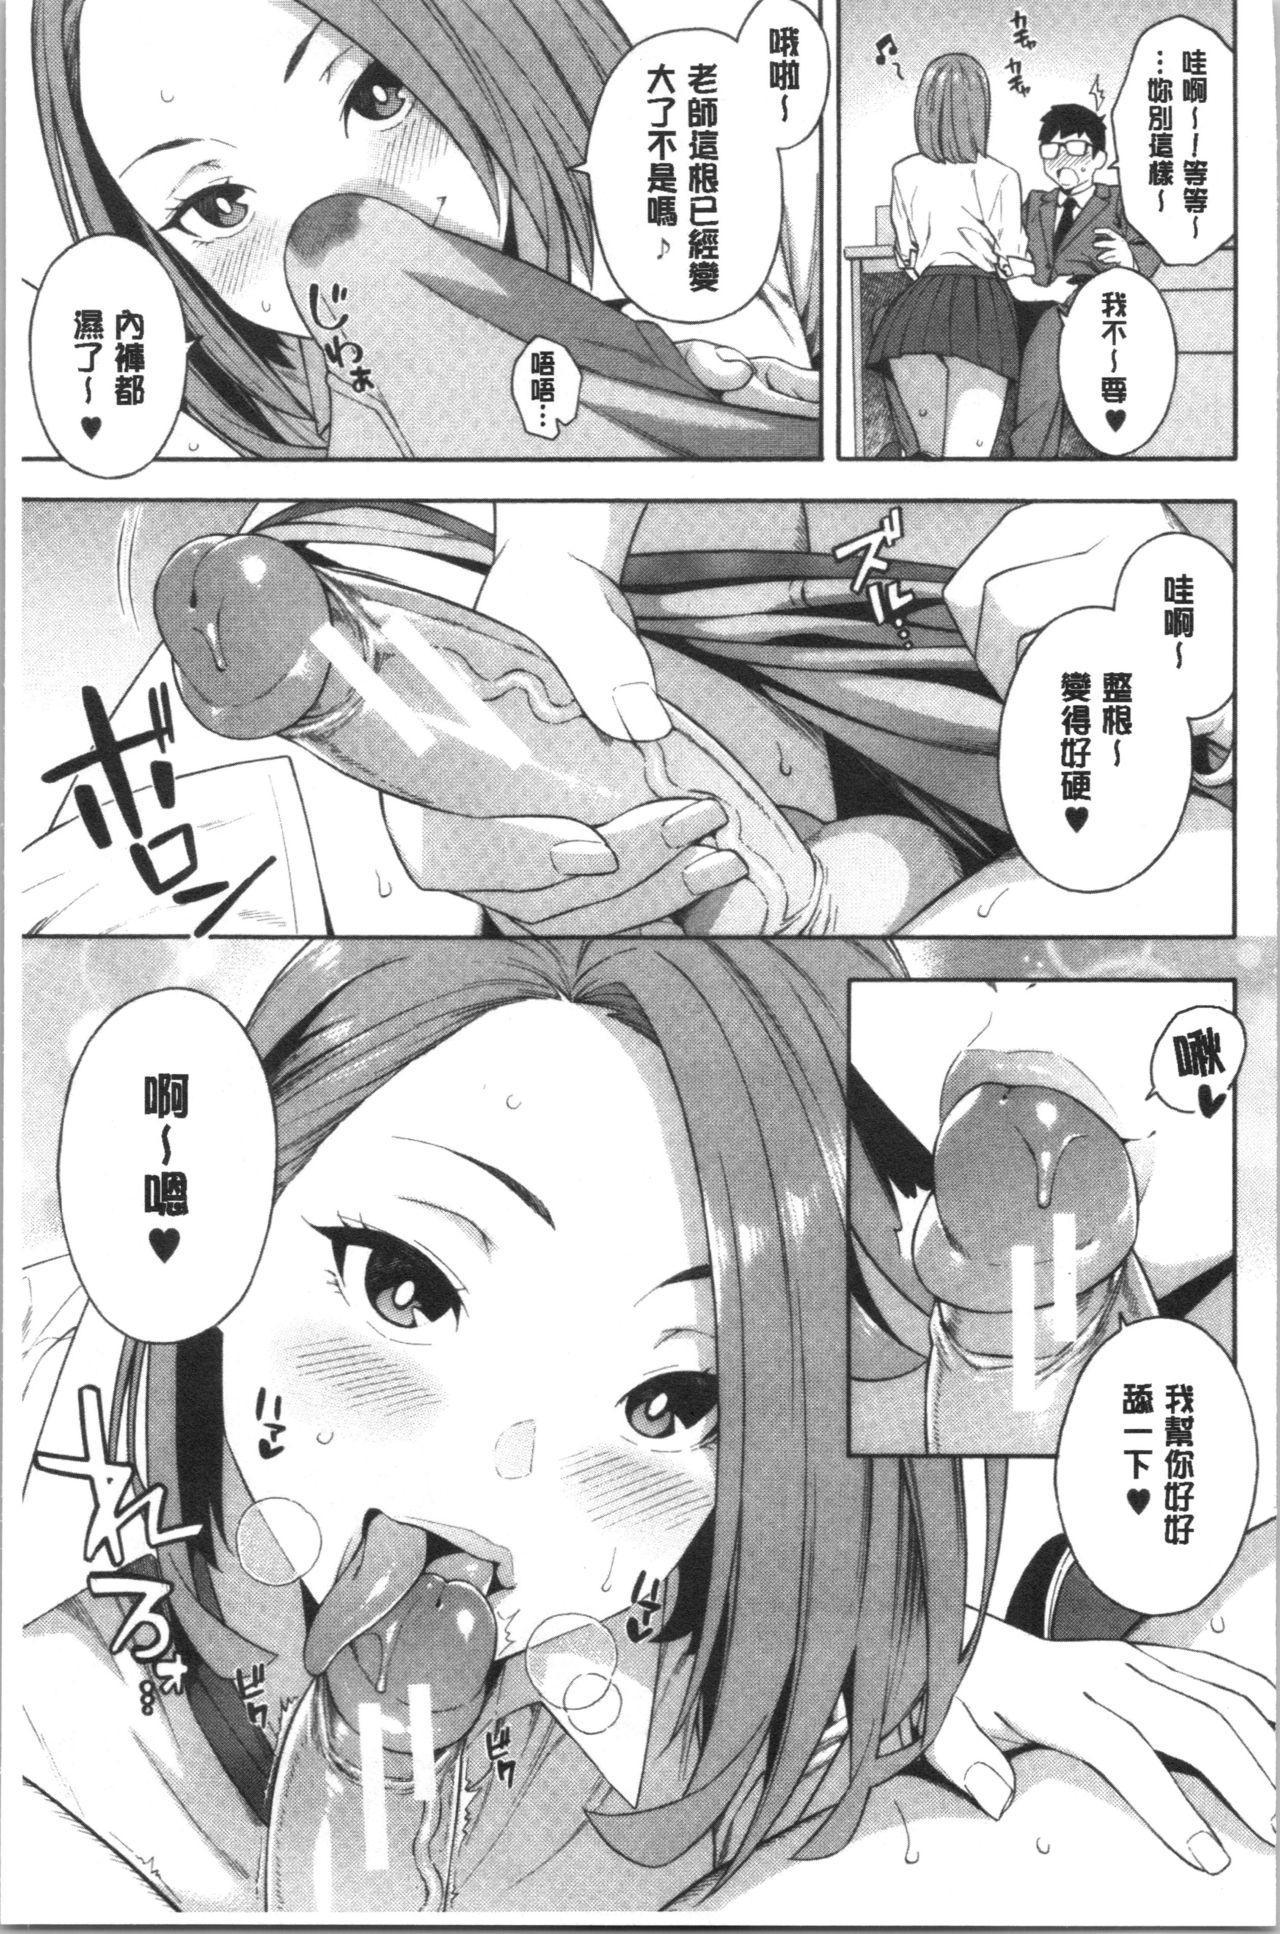 Okashite Ageru | 讓你來侵犯我 13